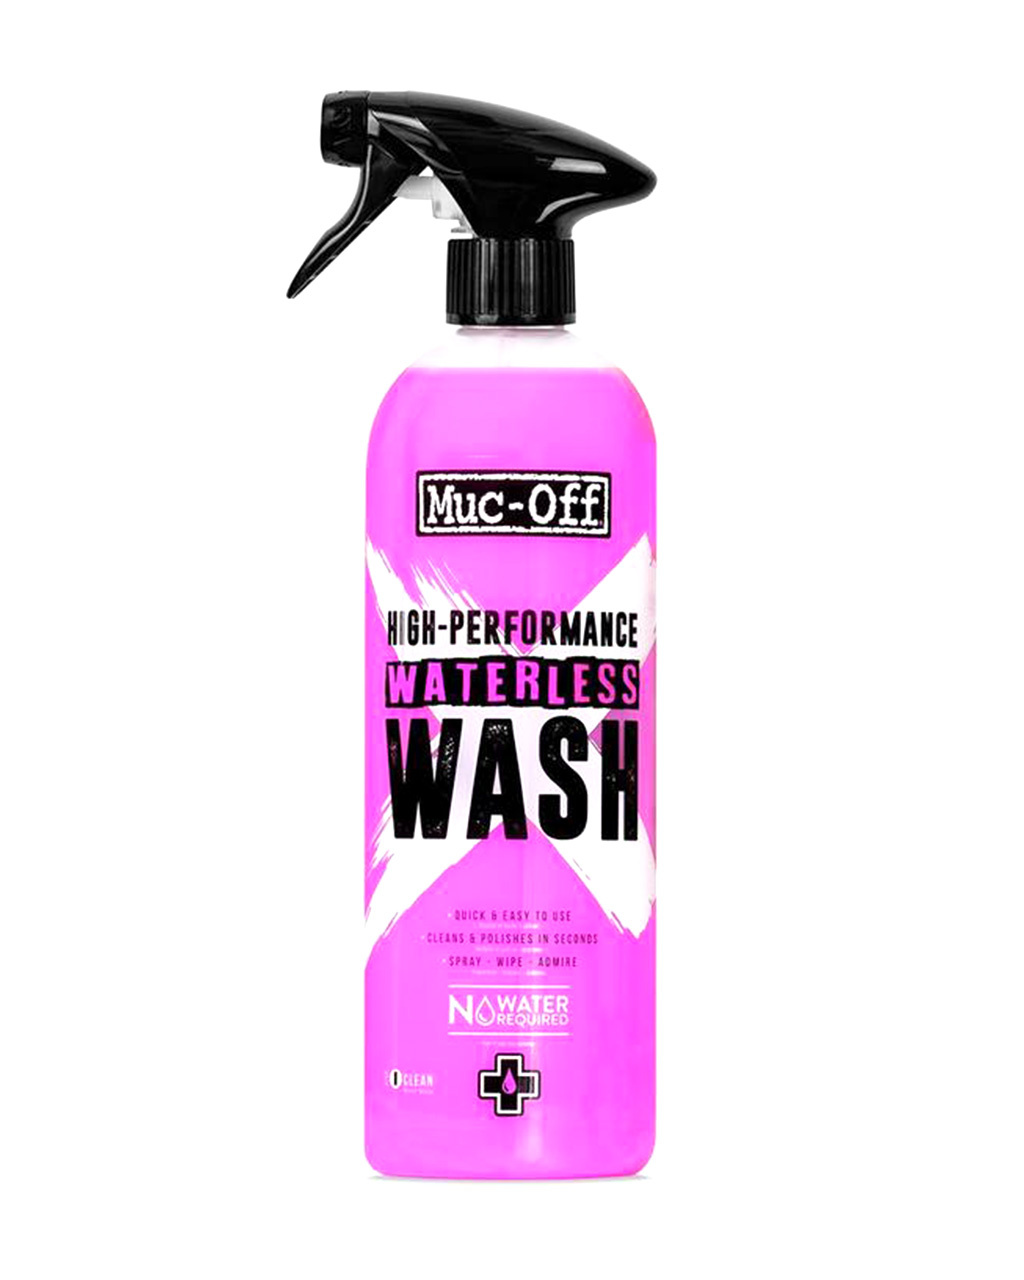 Muc-Off Muc-Off Waterless Wash